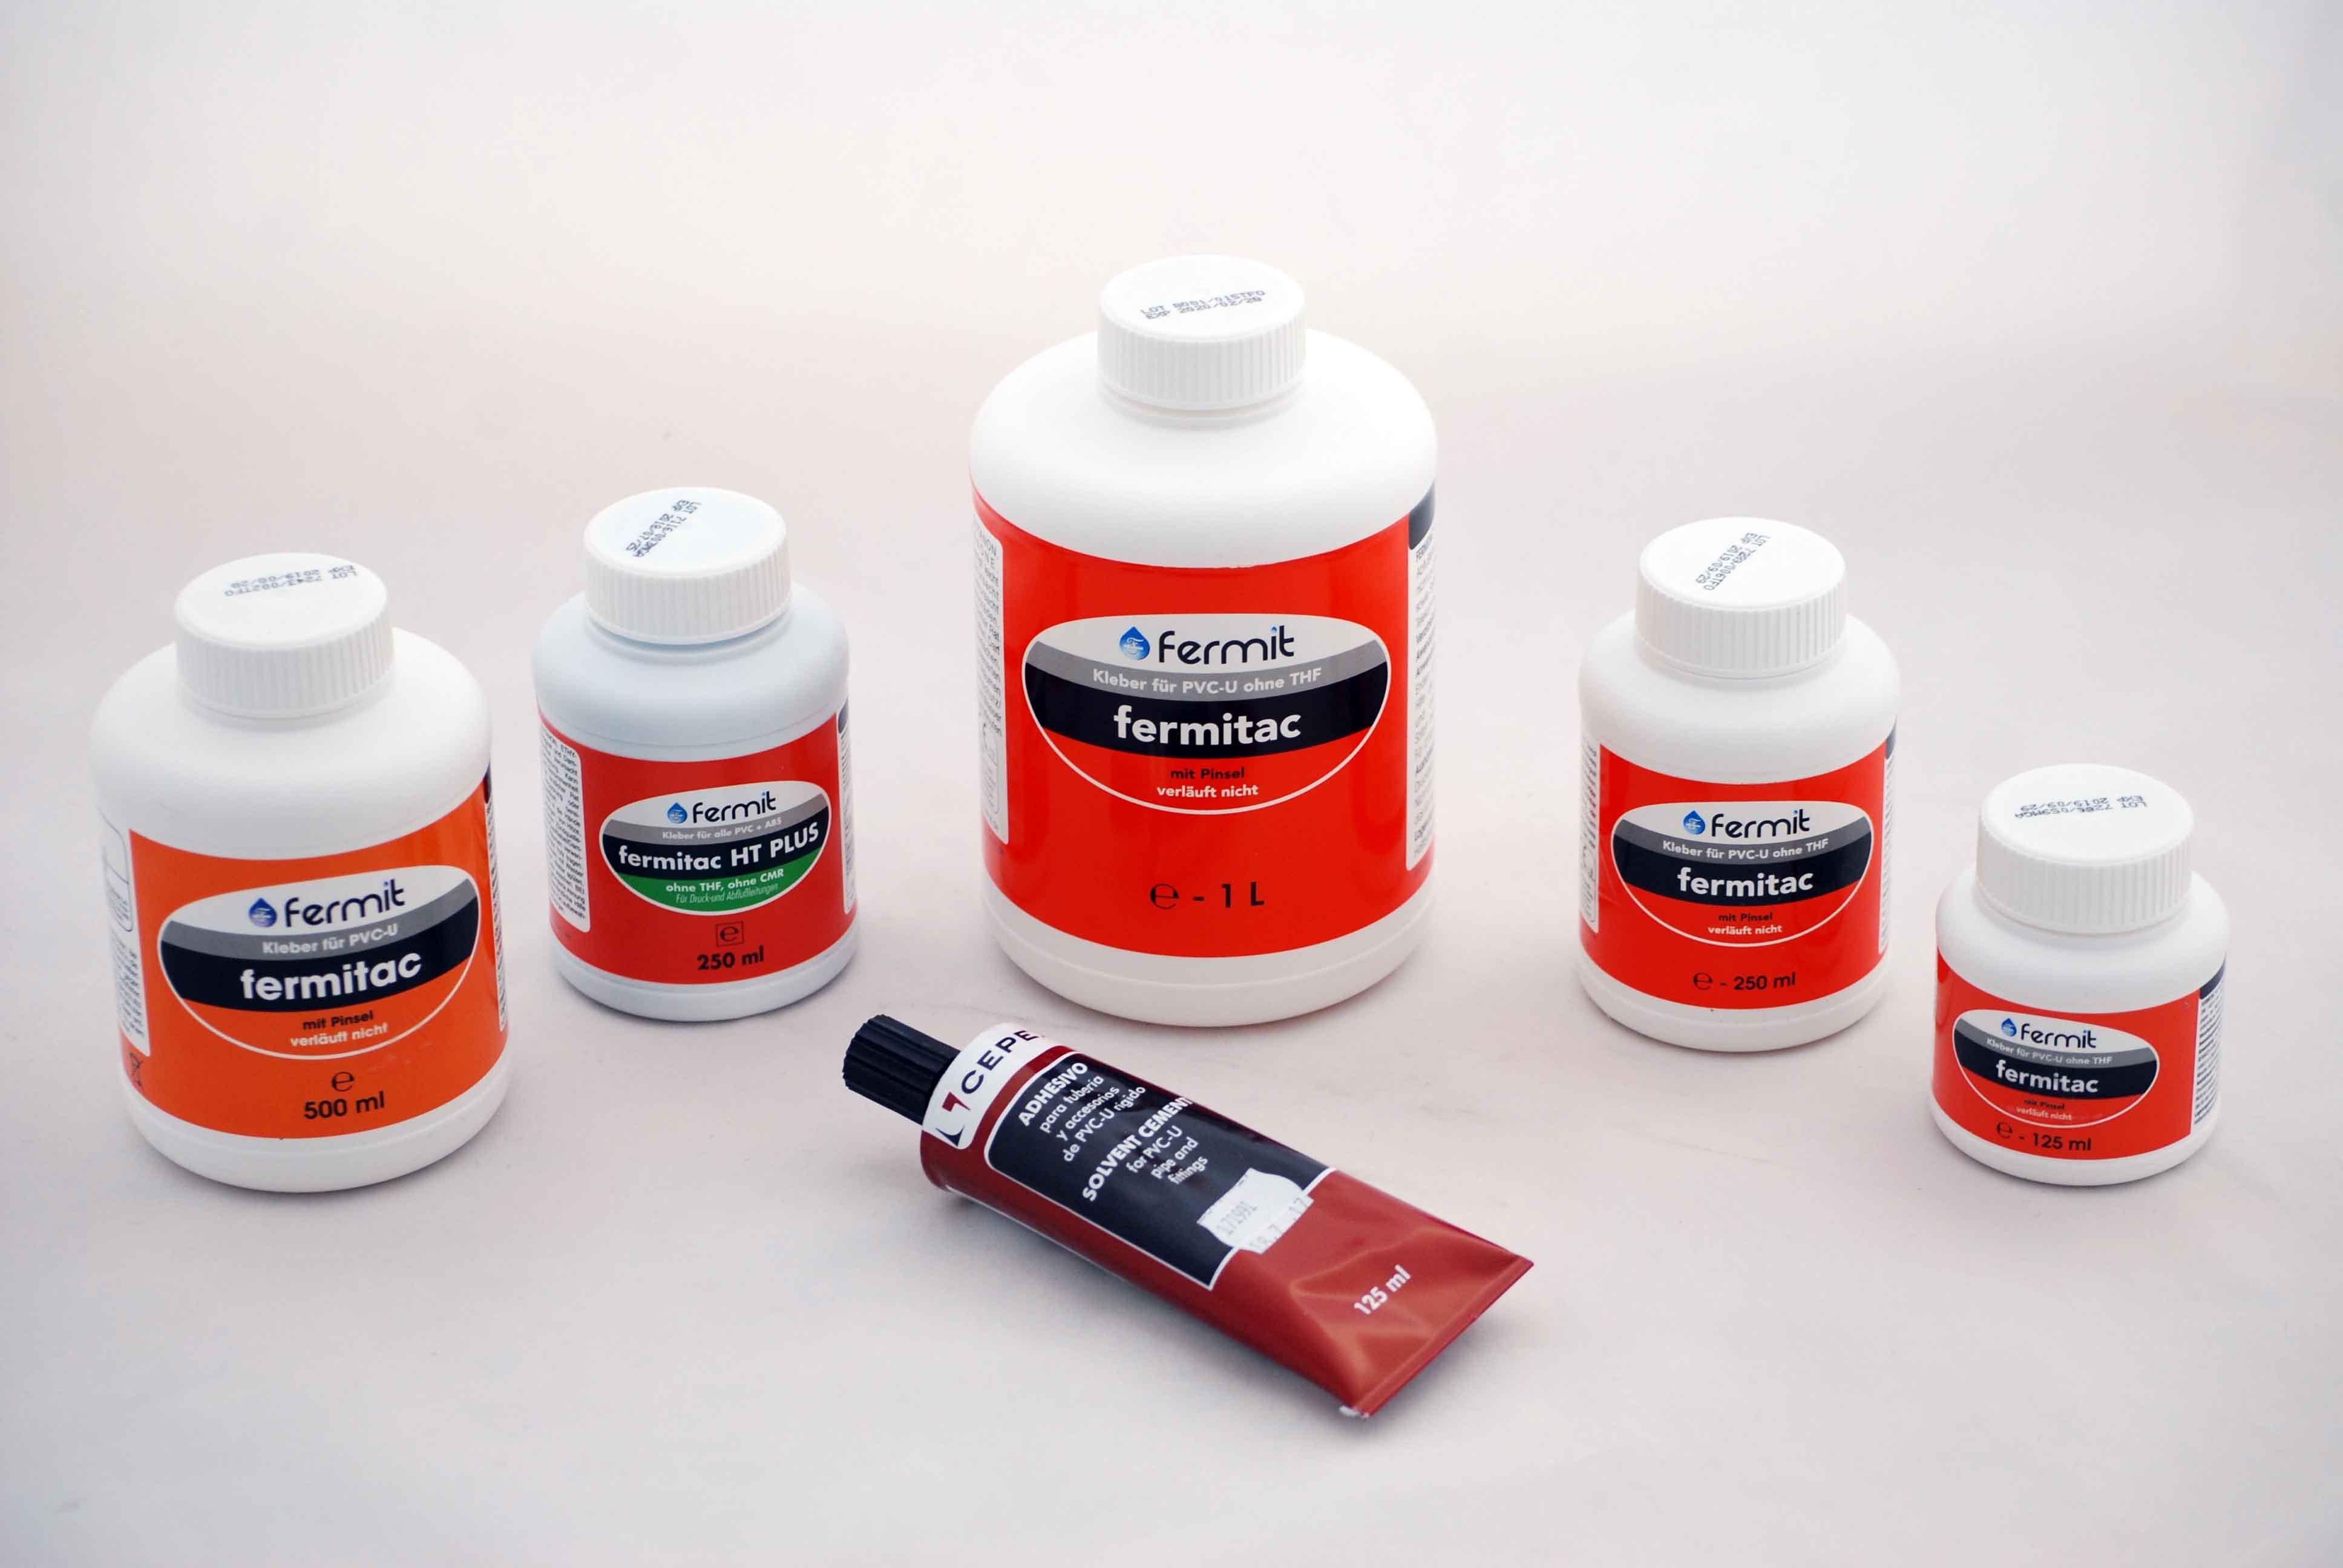 Favorit GWT Versandhandel - PVC-U Kleber, Hart PVC Kleber, Fermitac PVC-U KU22